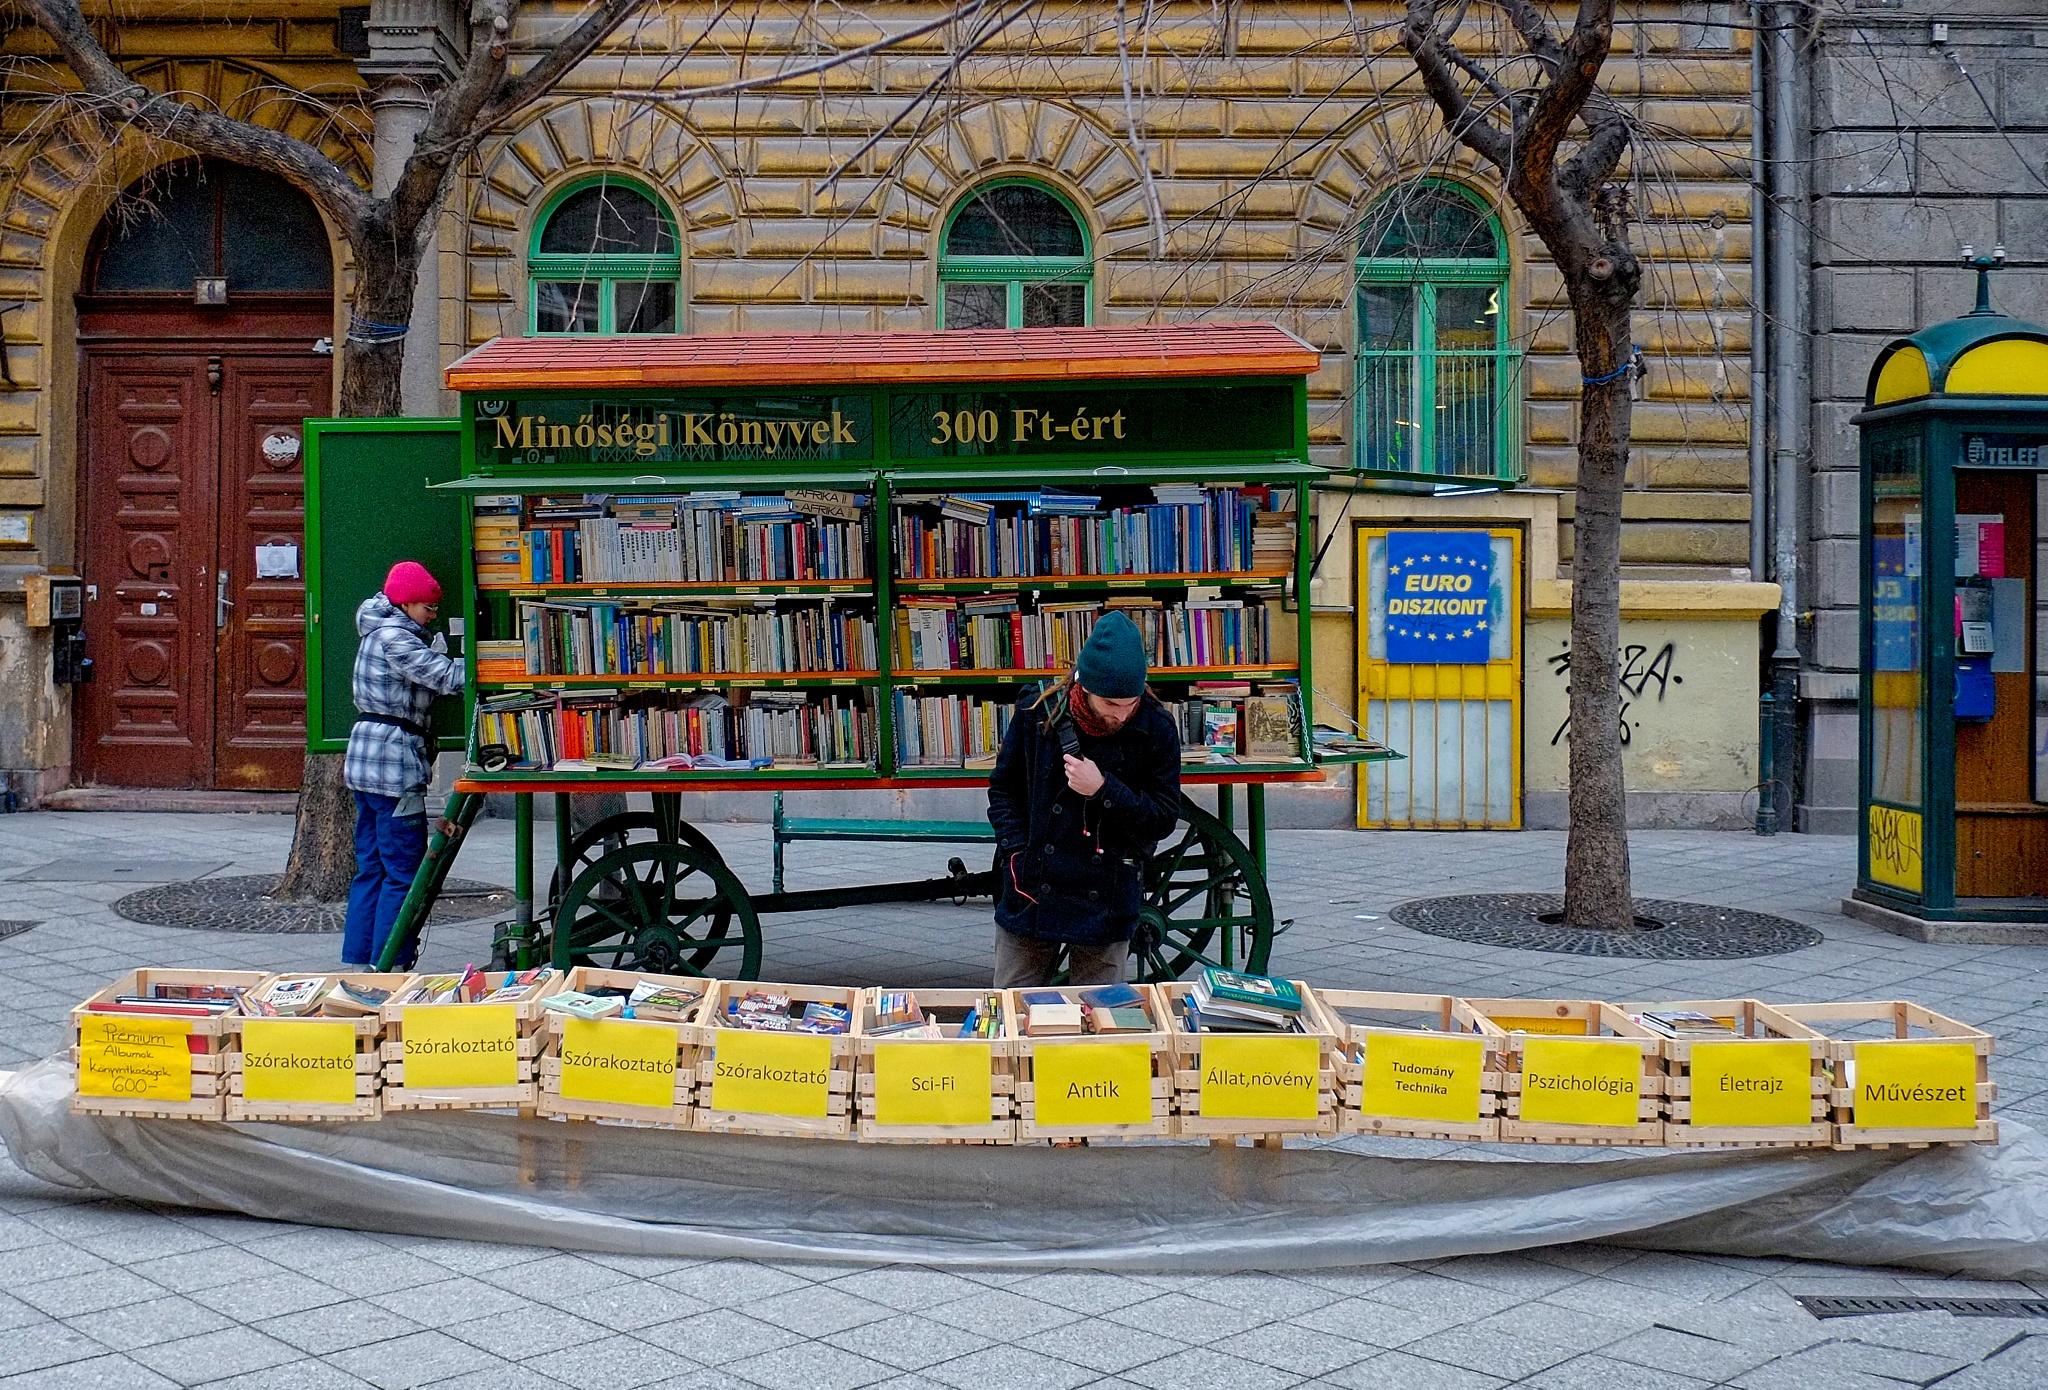 Book, which book to choose  by Goran Jorganovich